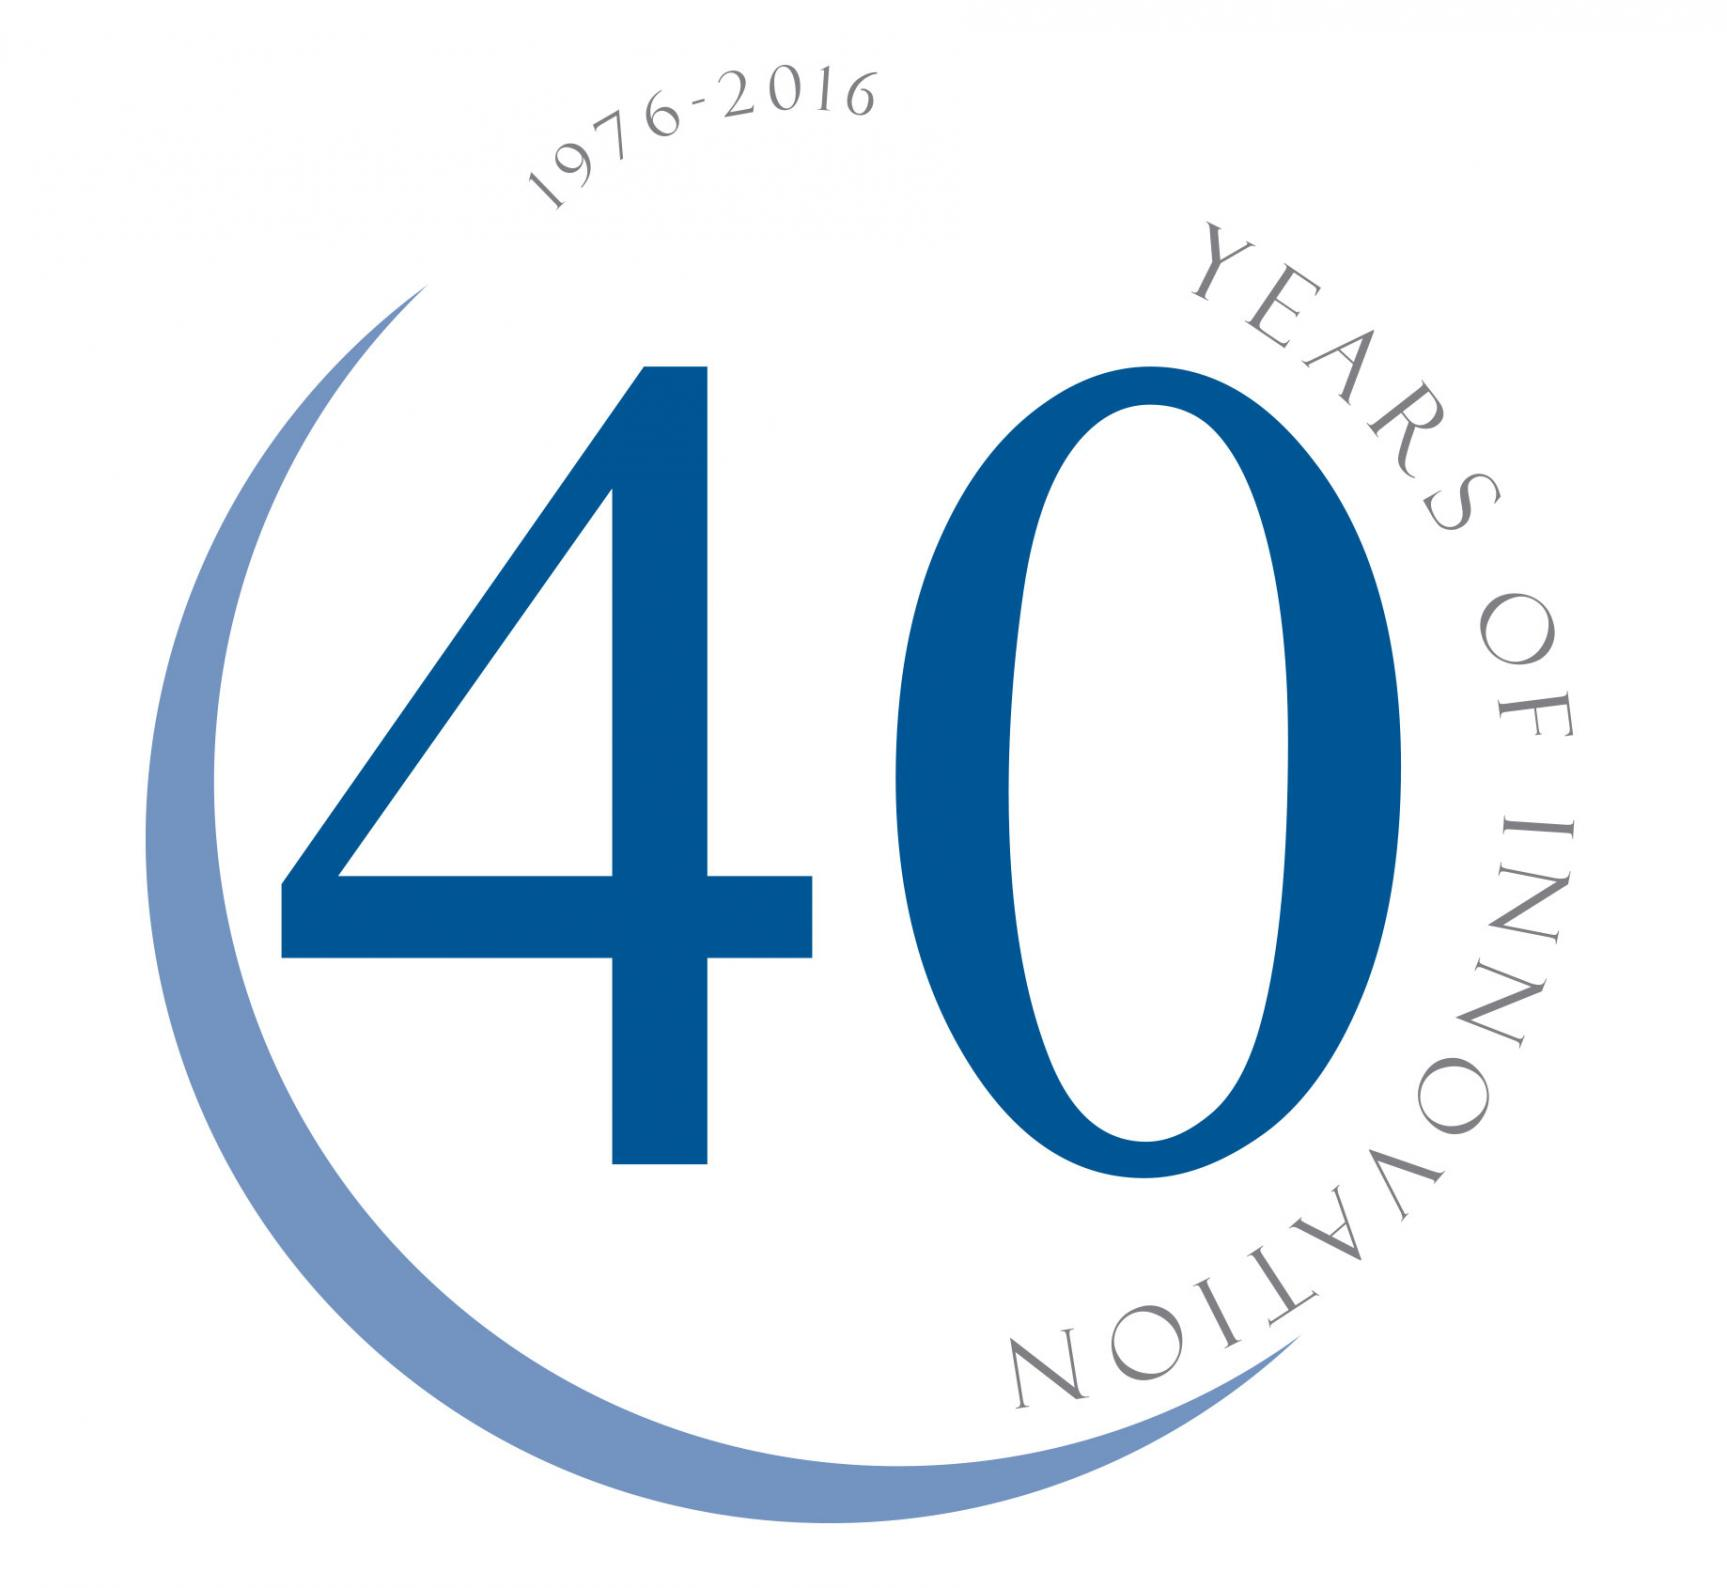 GEW 40 Years of Service